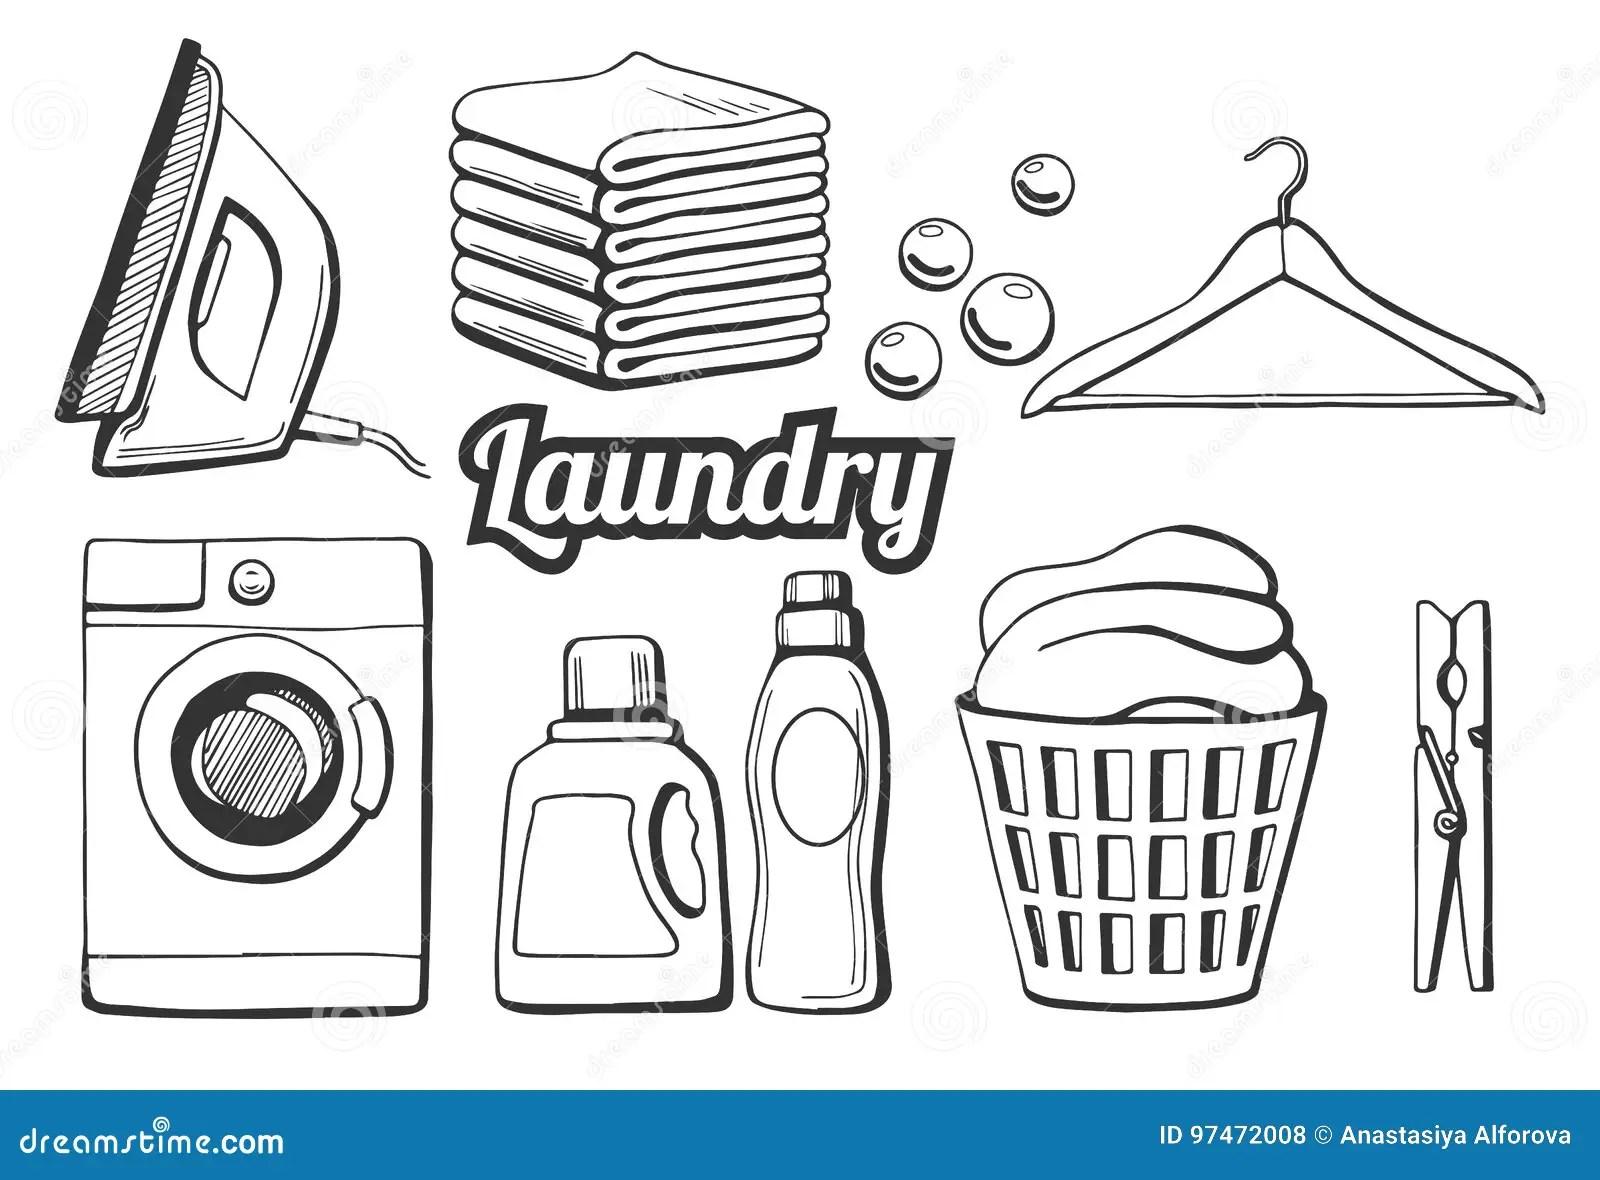 Laundry Symbol